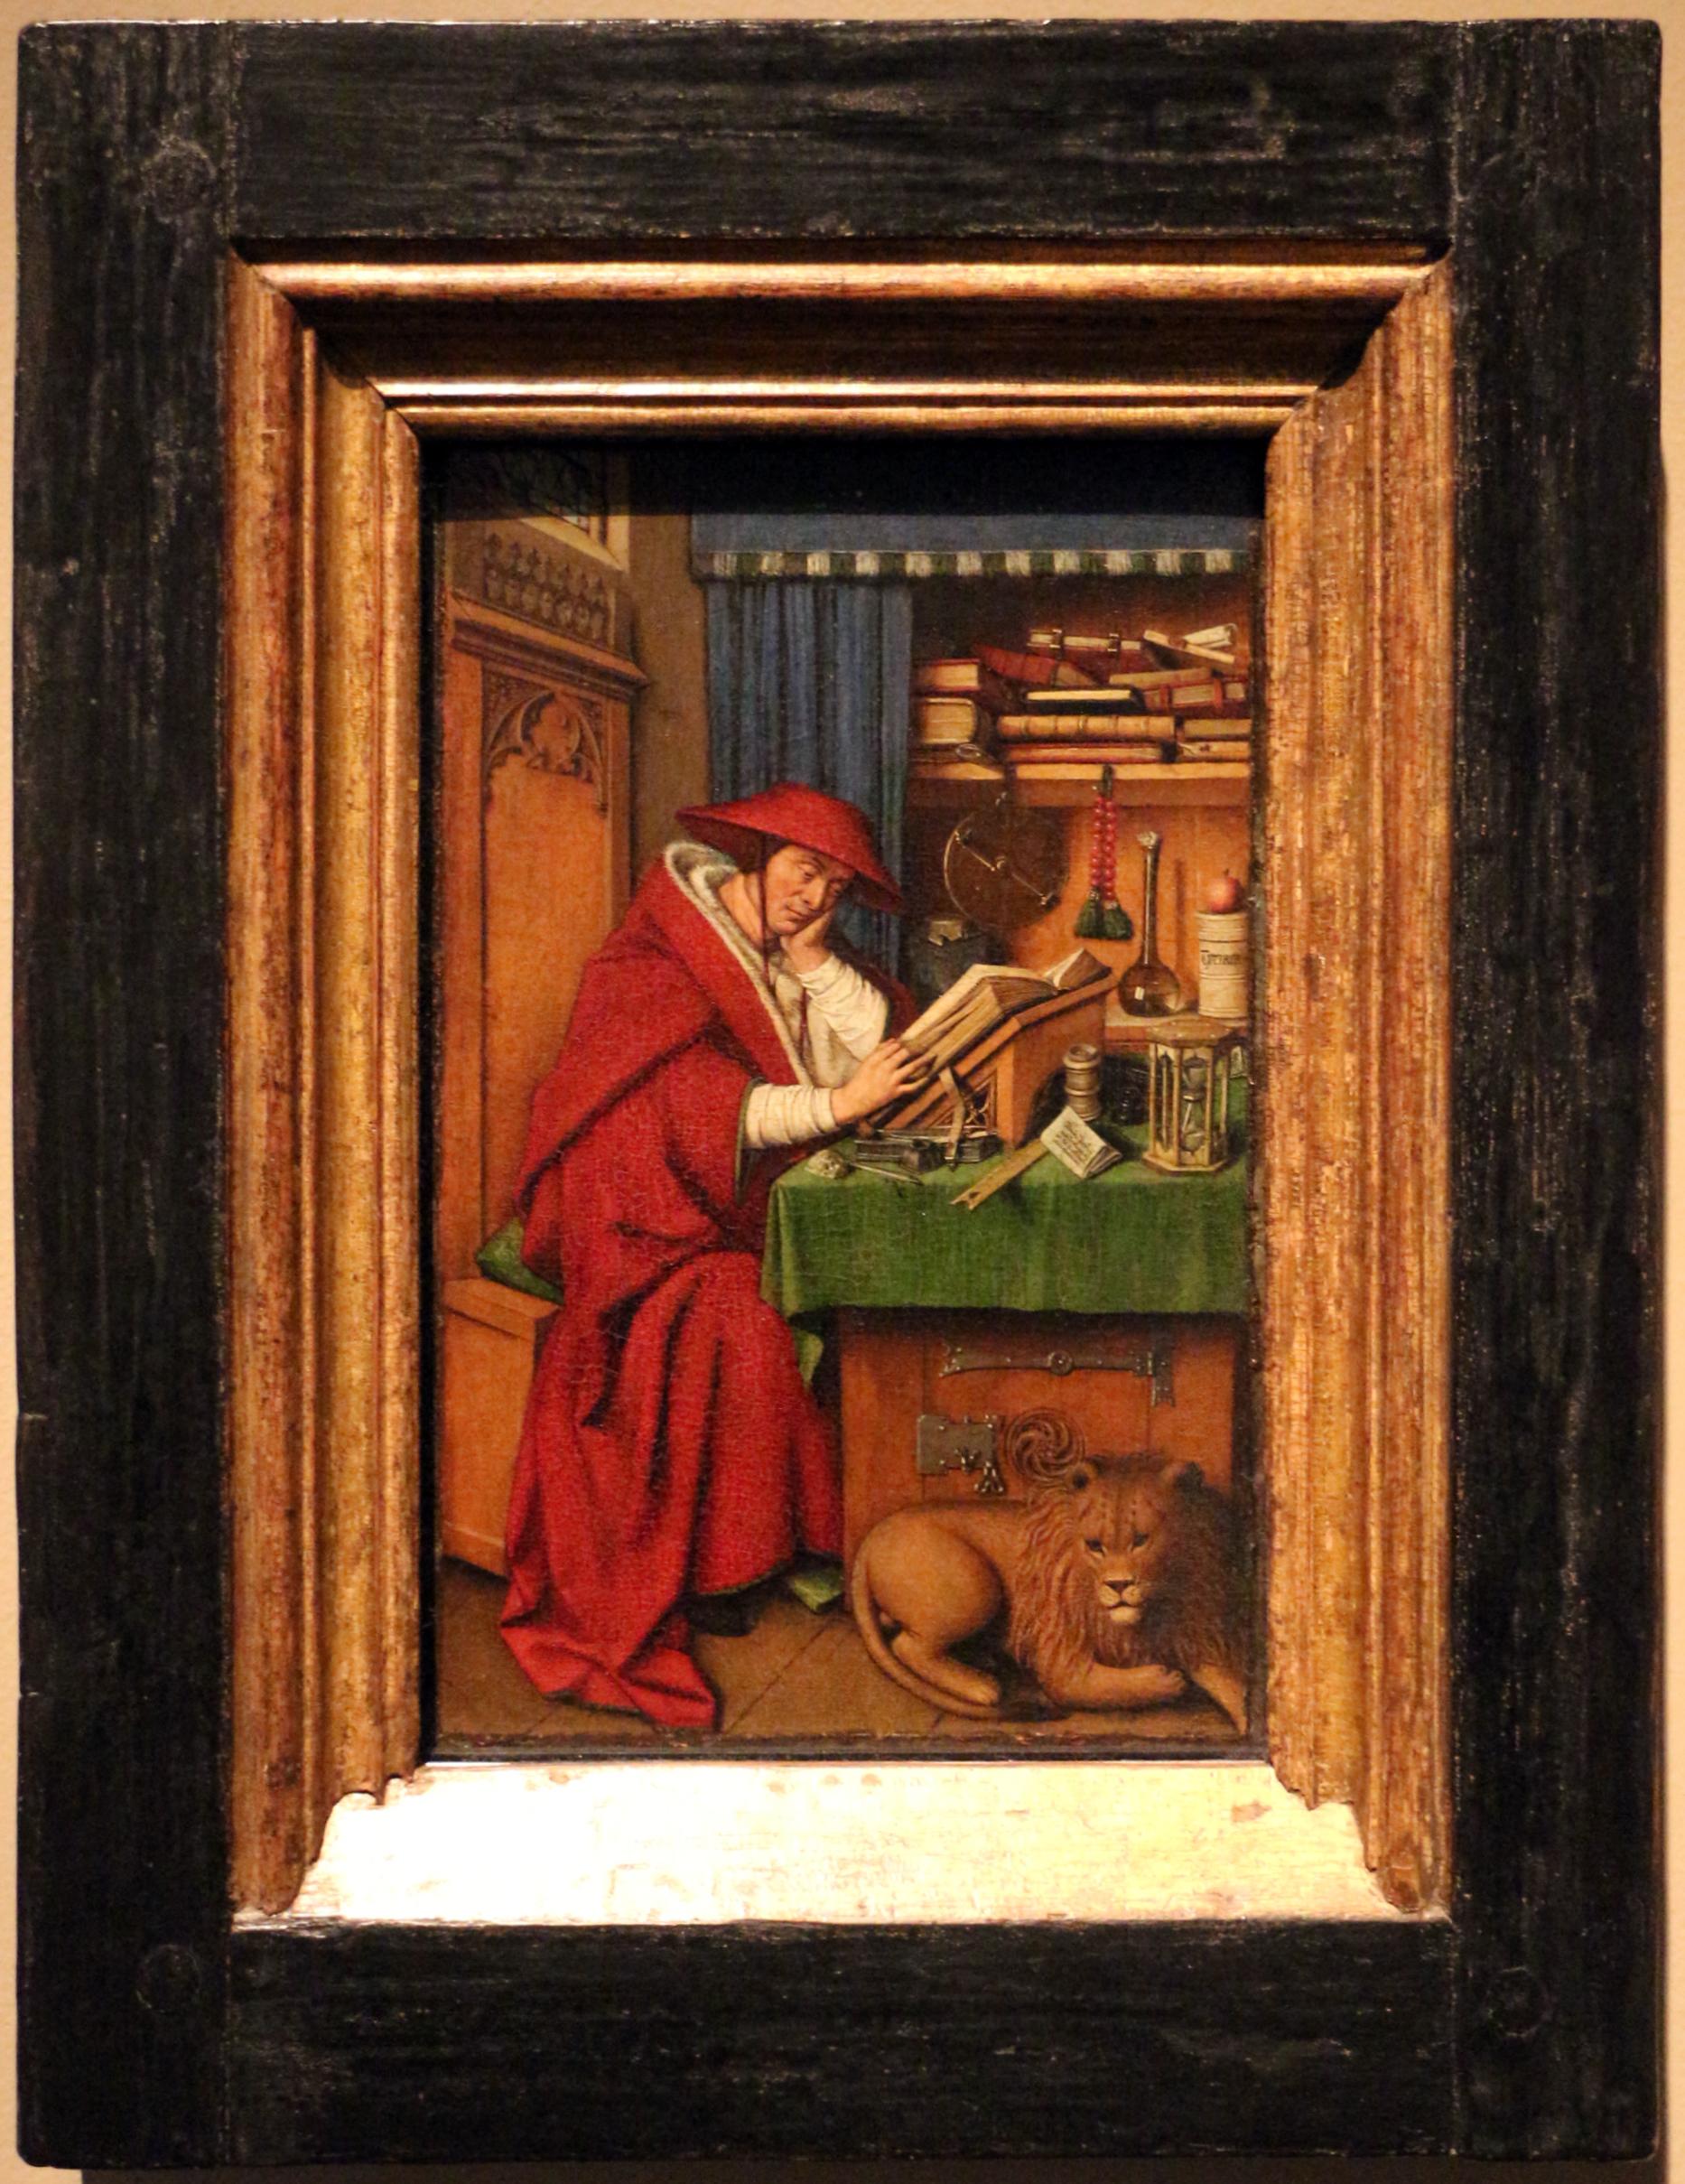 Wonderbaar File:Jan van eyck, san girolamo nello studio, 1435 ca. 01.jpg CL-13